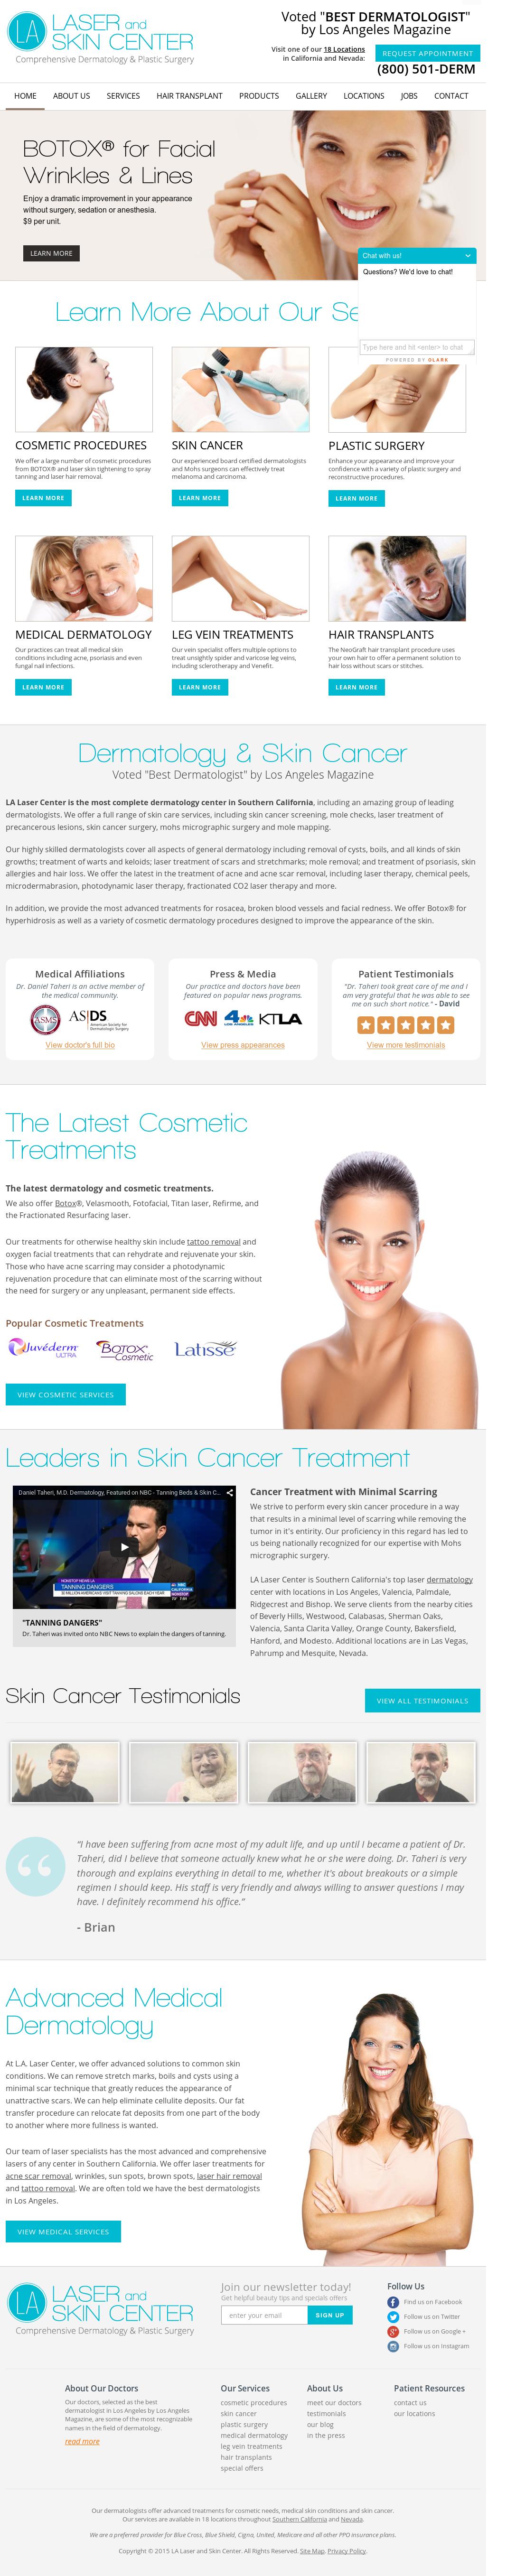 Owler Reports - La Laser And Skin Center: Dr  Daniel Taheri and LA